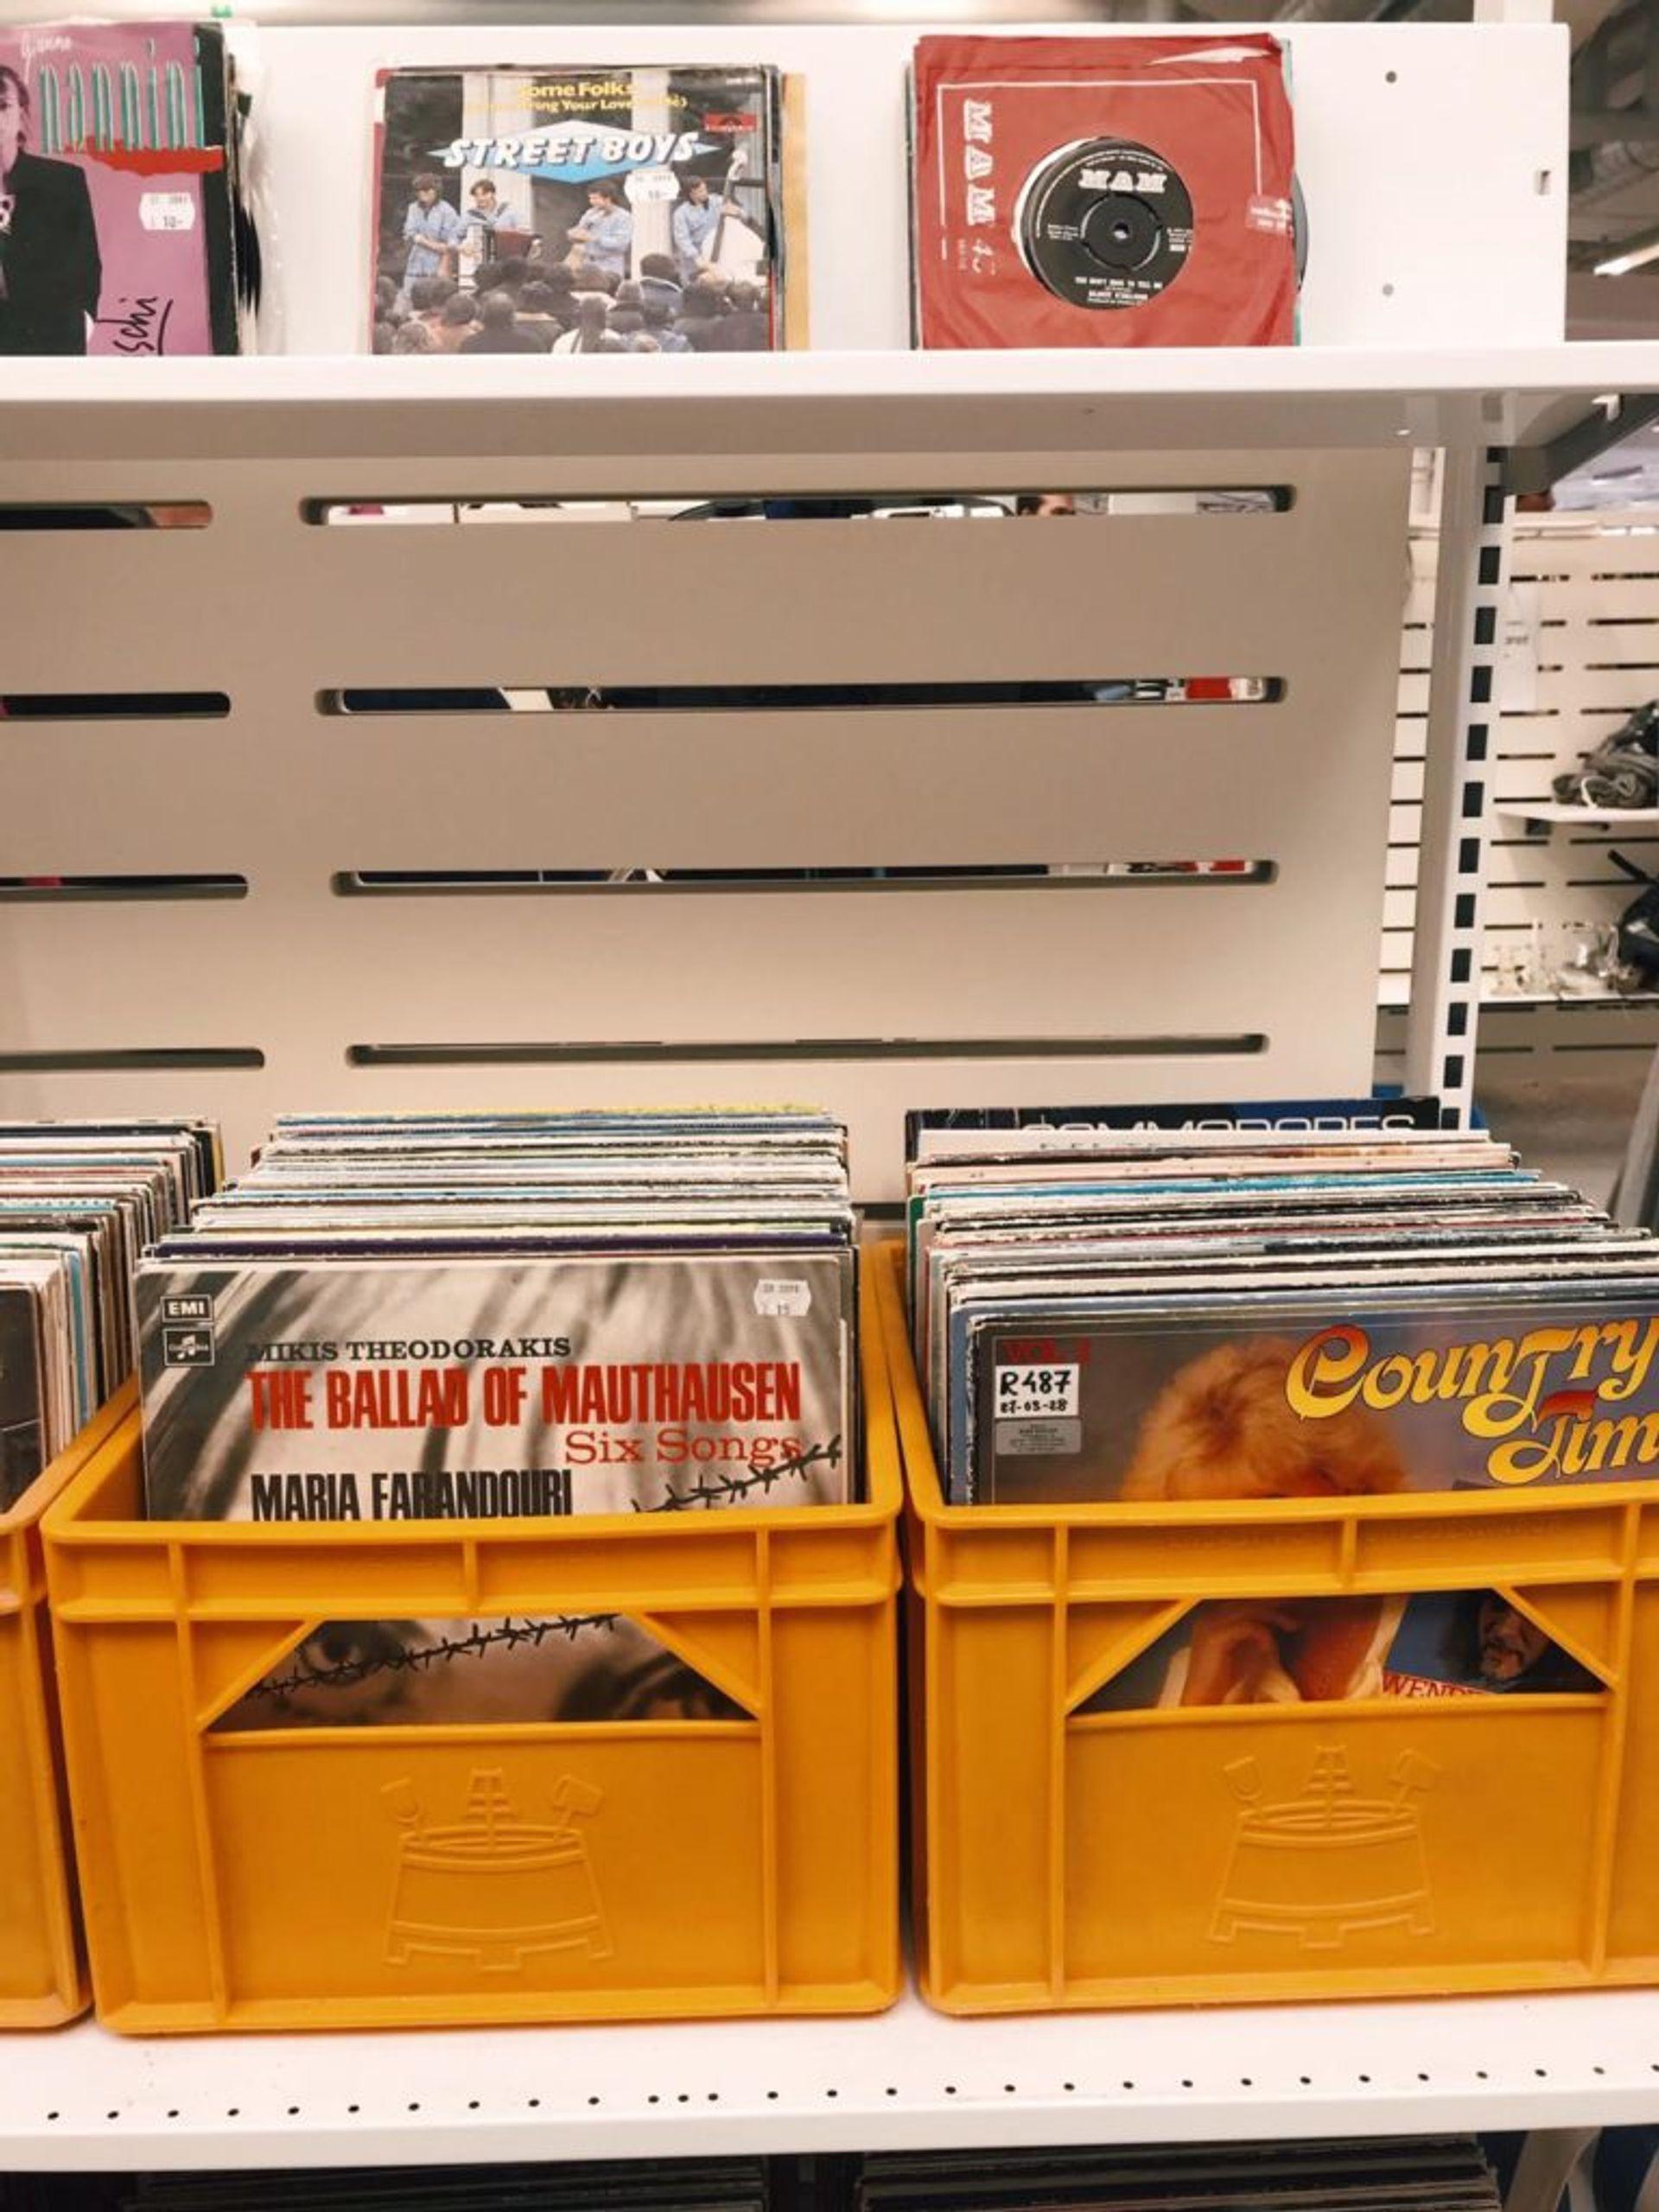 Racks of vinyl records.